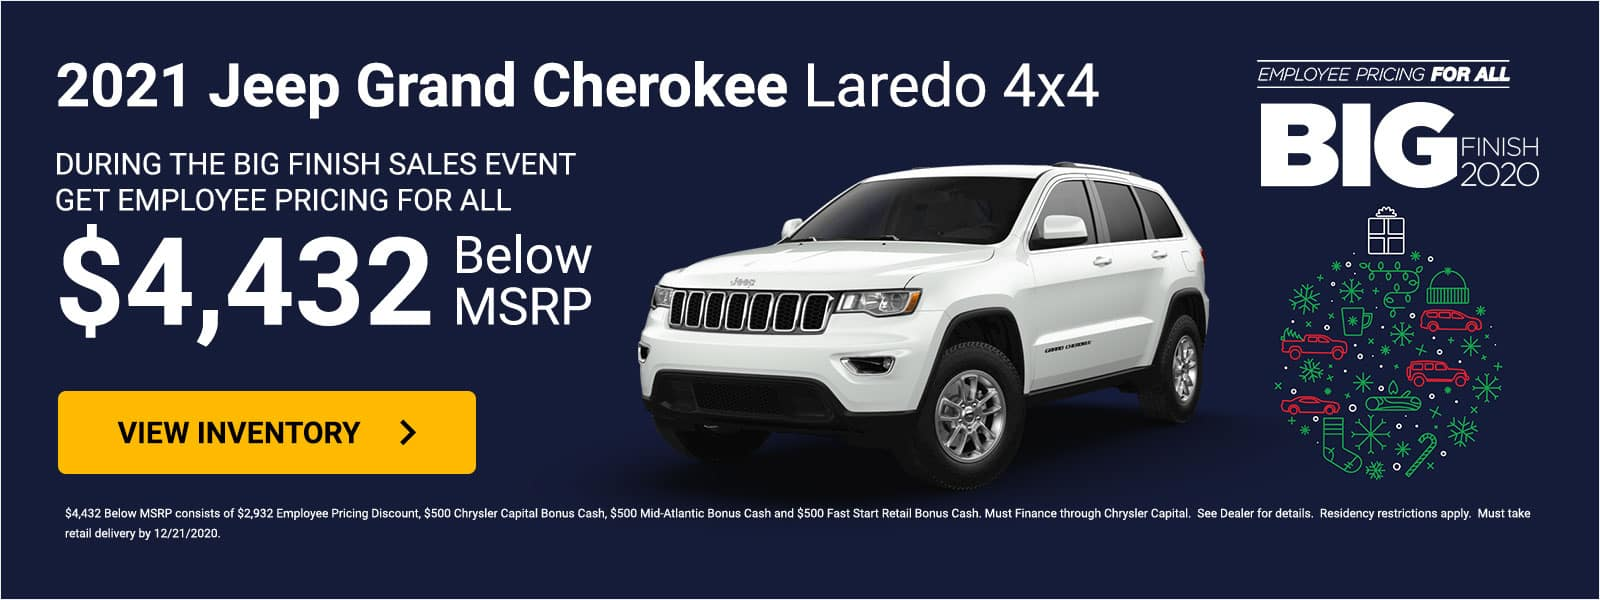 MABC_Banners_1600x600_2020-12_509913_21-Jeep-Grand-Cherokee